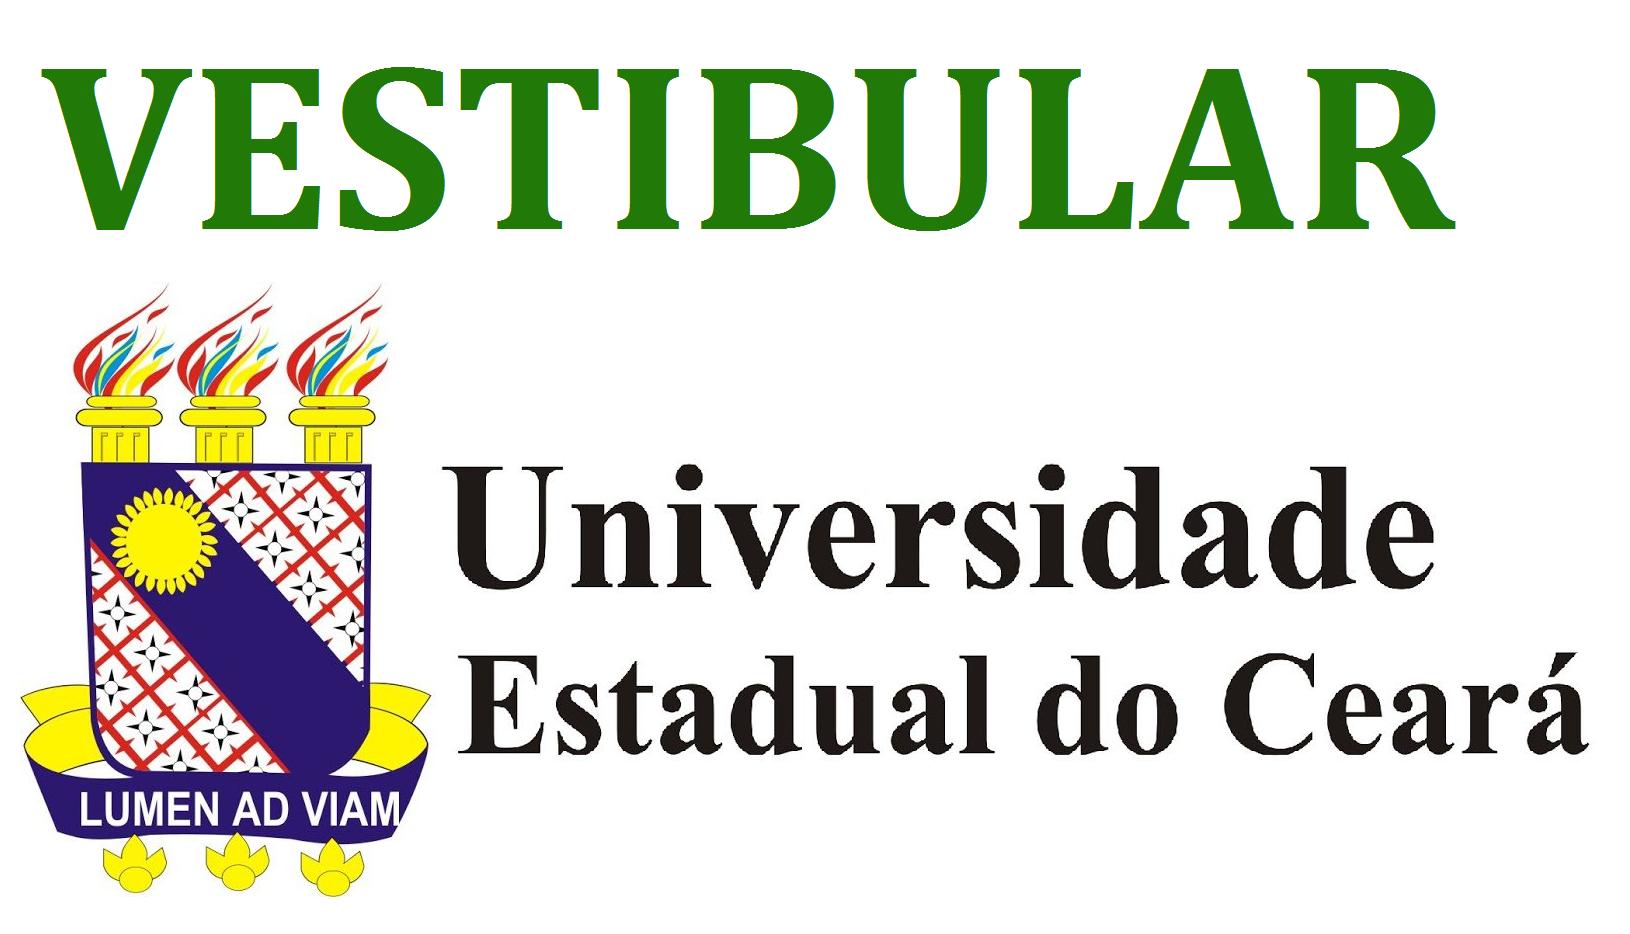 Vestibular UECE 2022